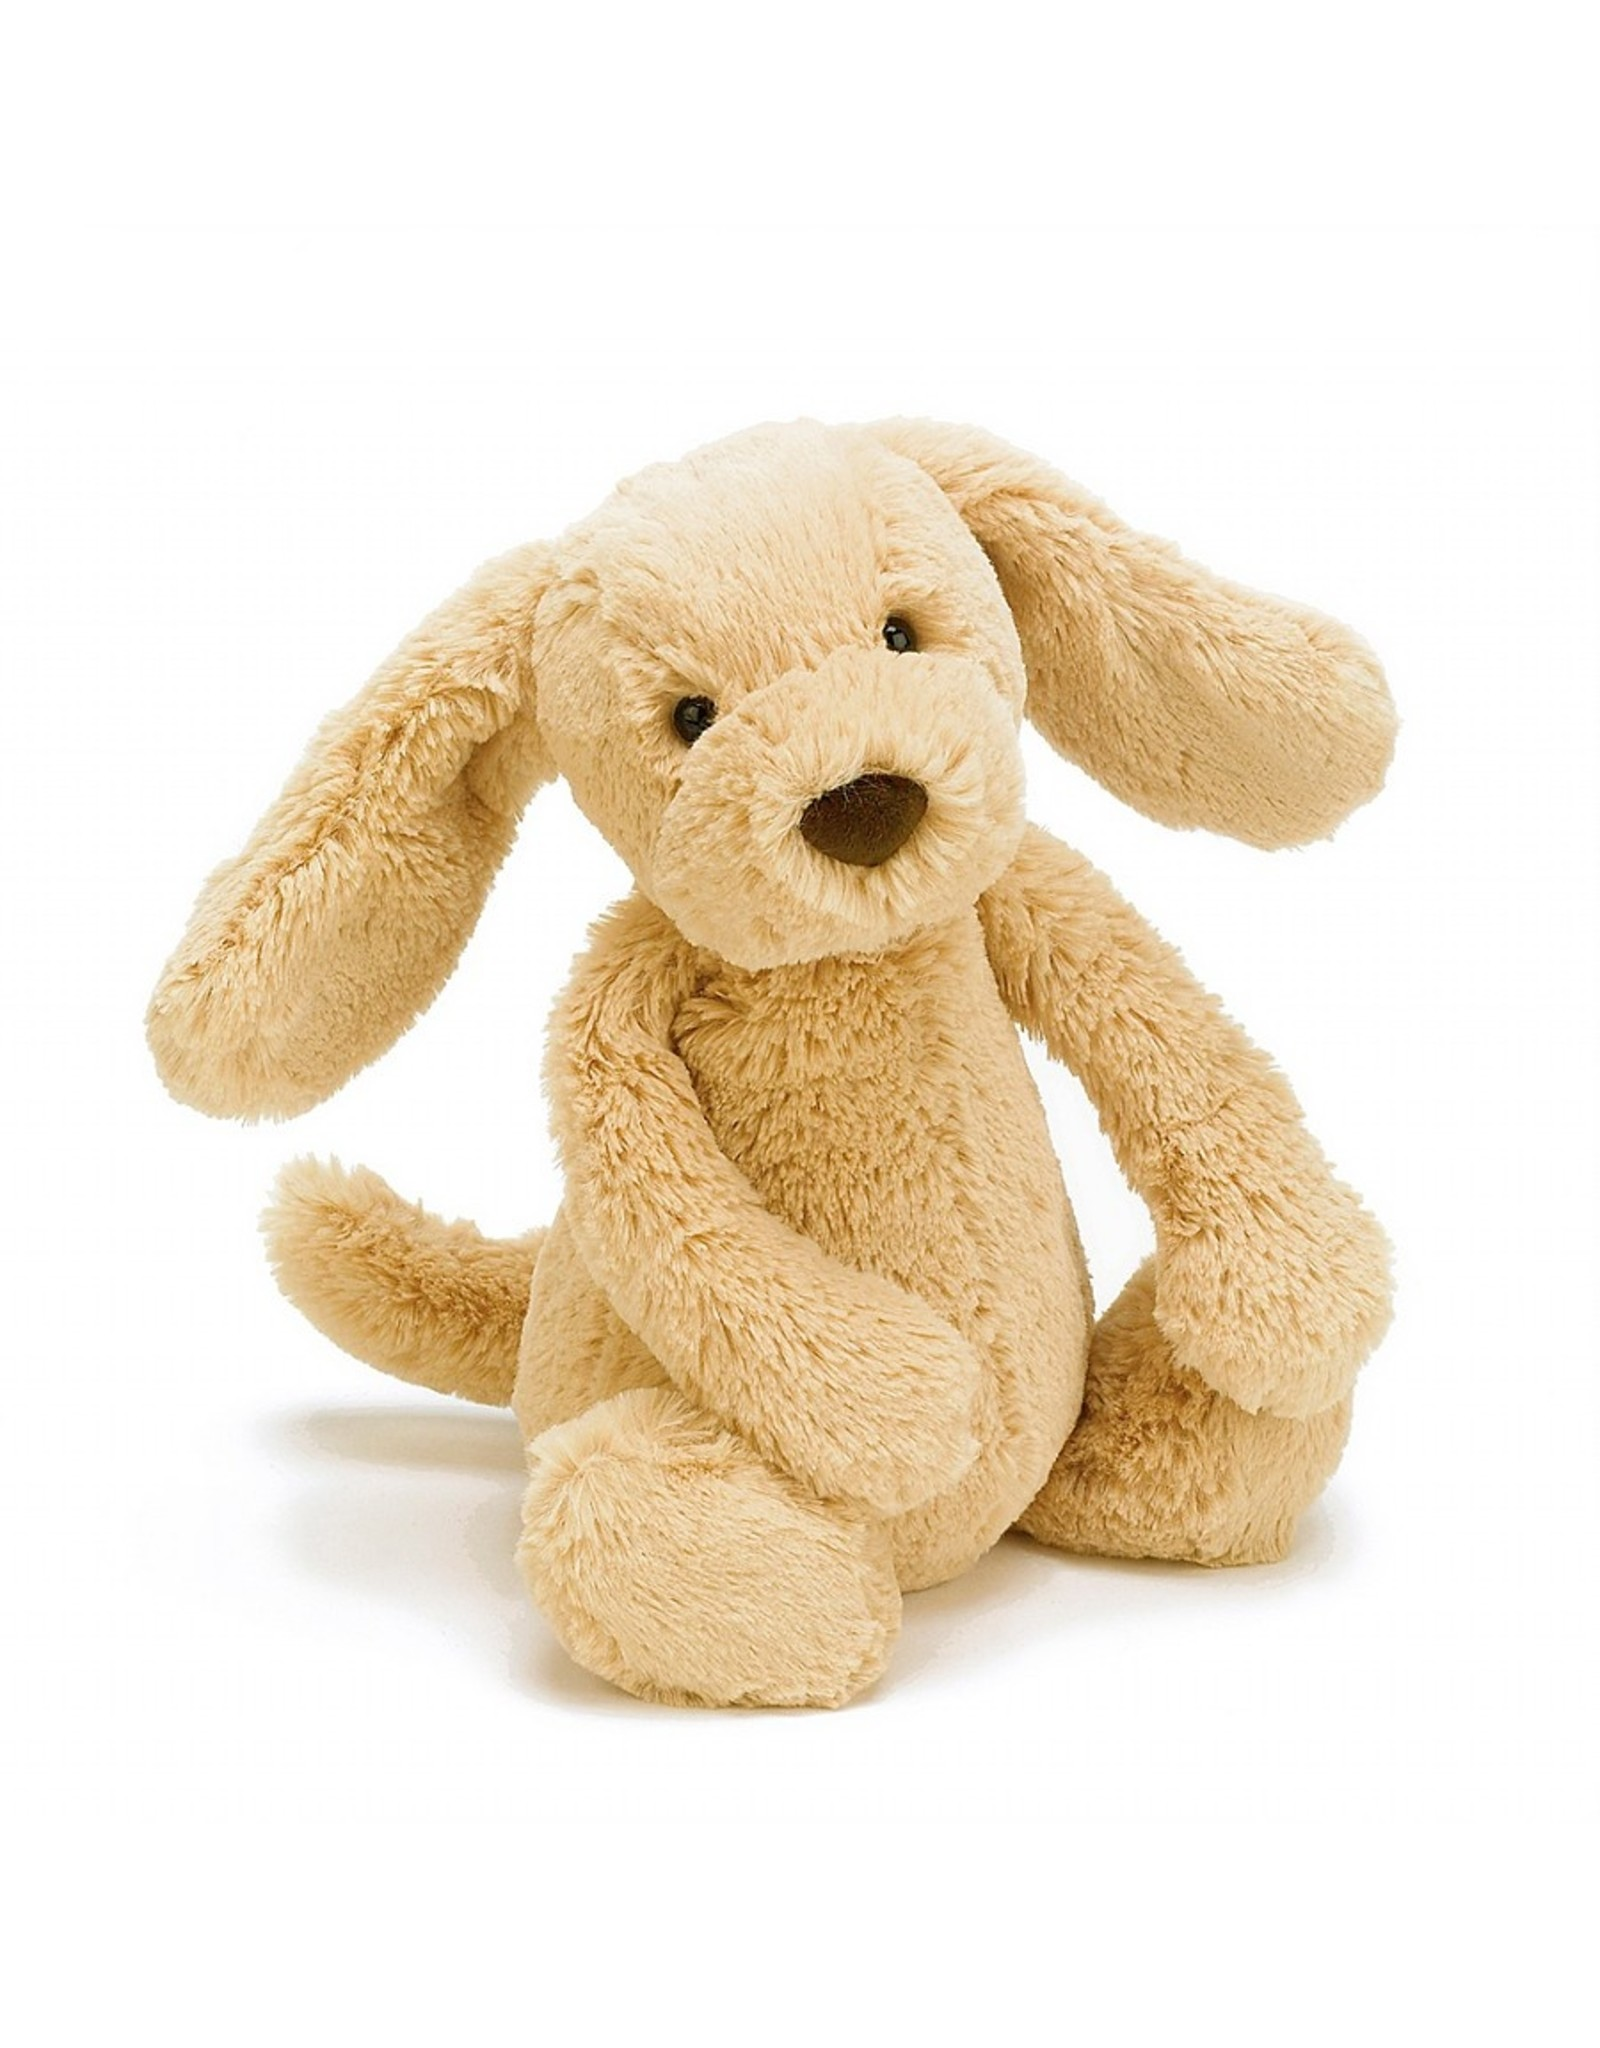 Jellycat stuffed animal - bashful toffee puppy - medium